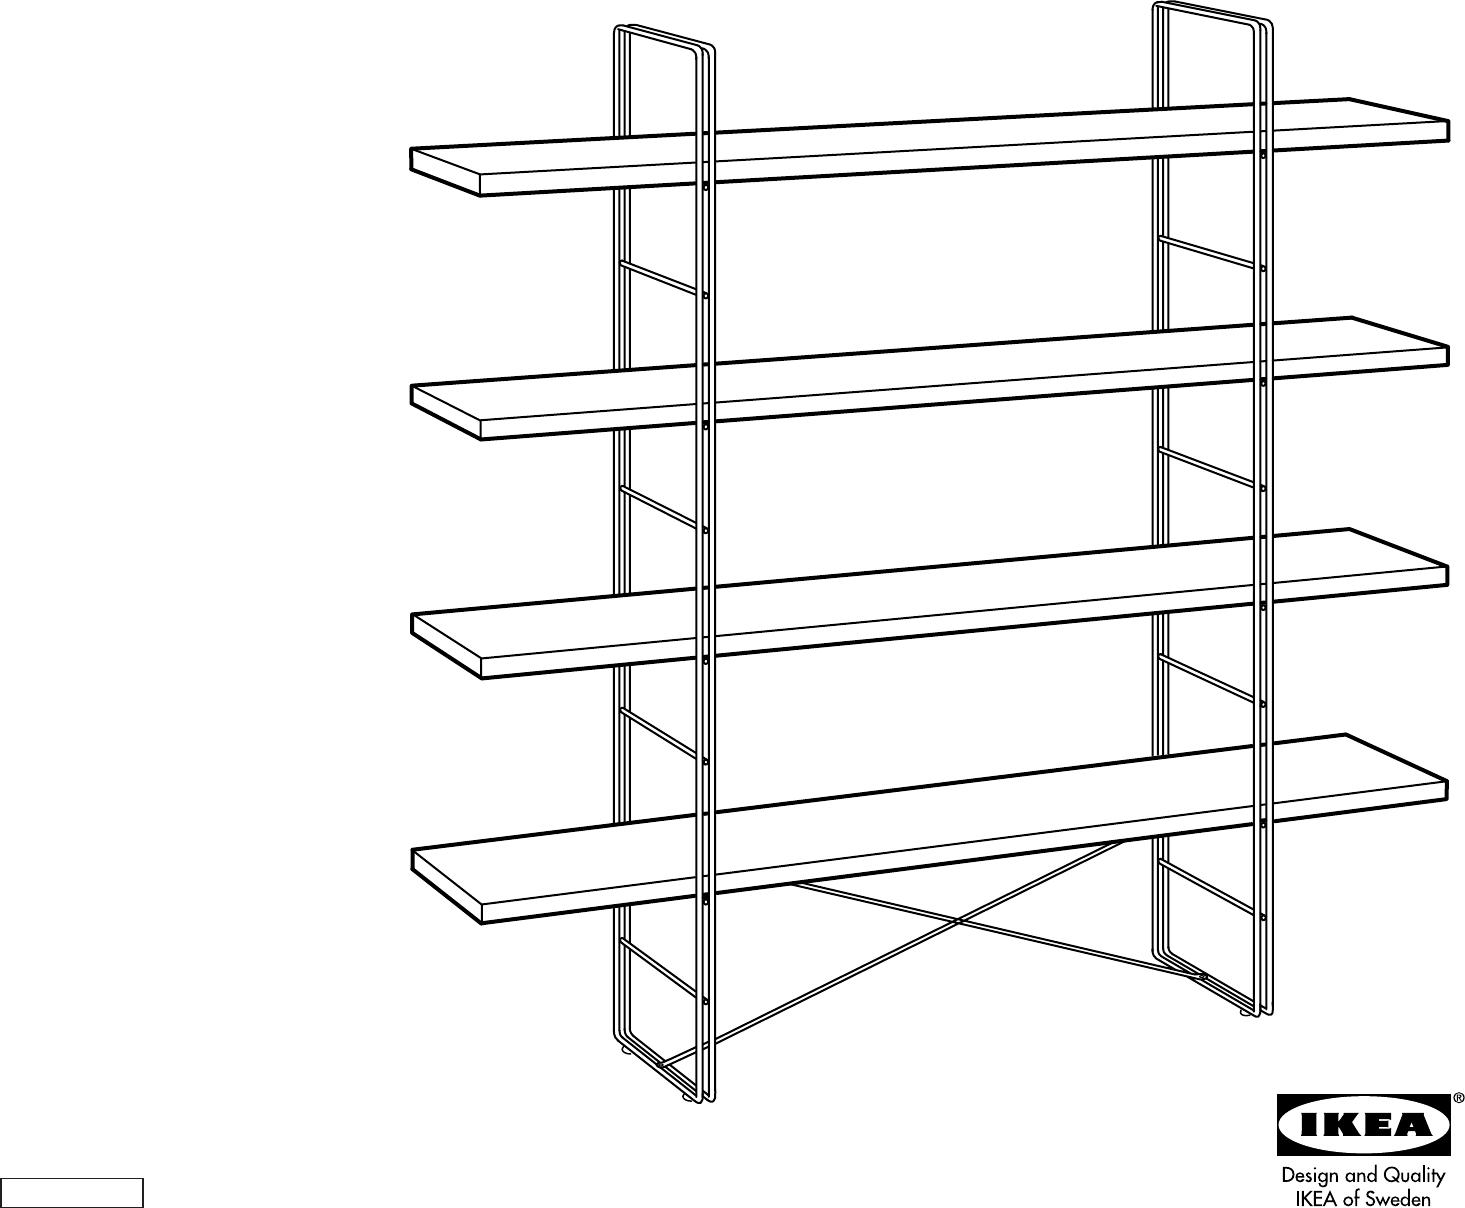 Handleiding Ikea Enetri Open Kast Pagina 1 Van 4 Dansk